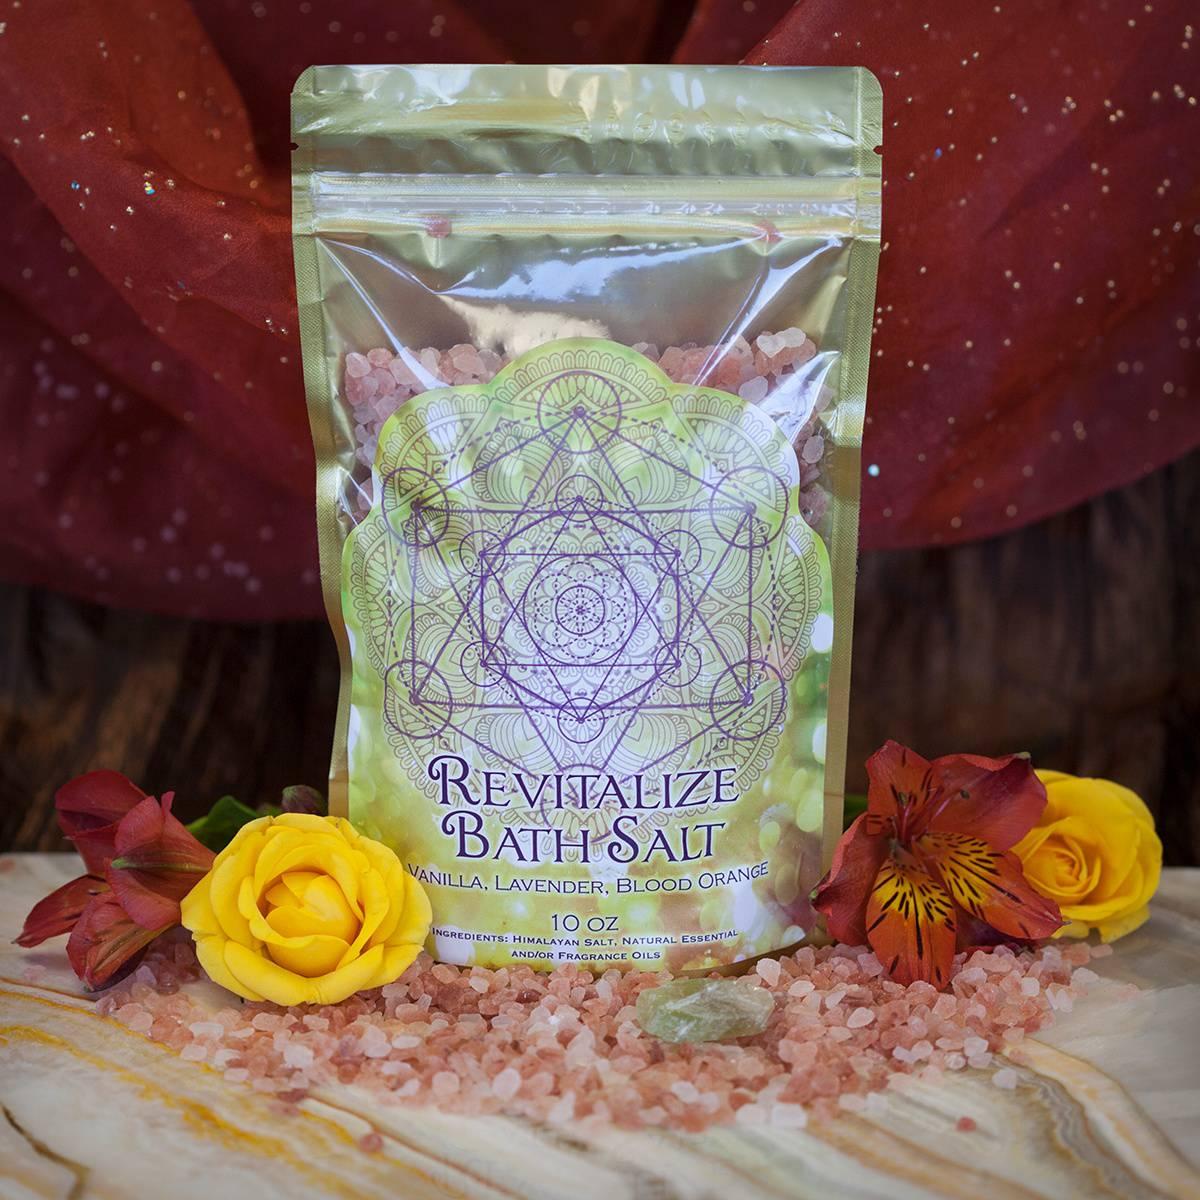 Revitalize Bath Salts 4_25